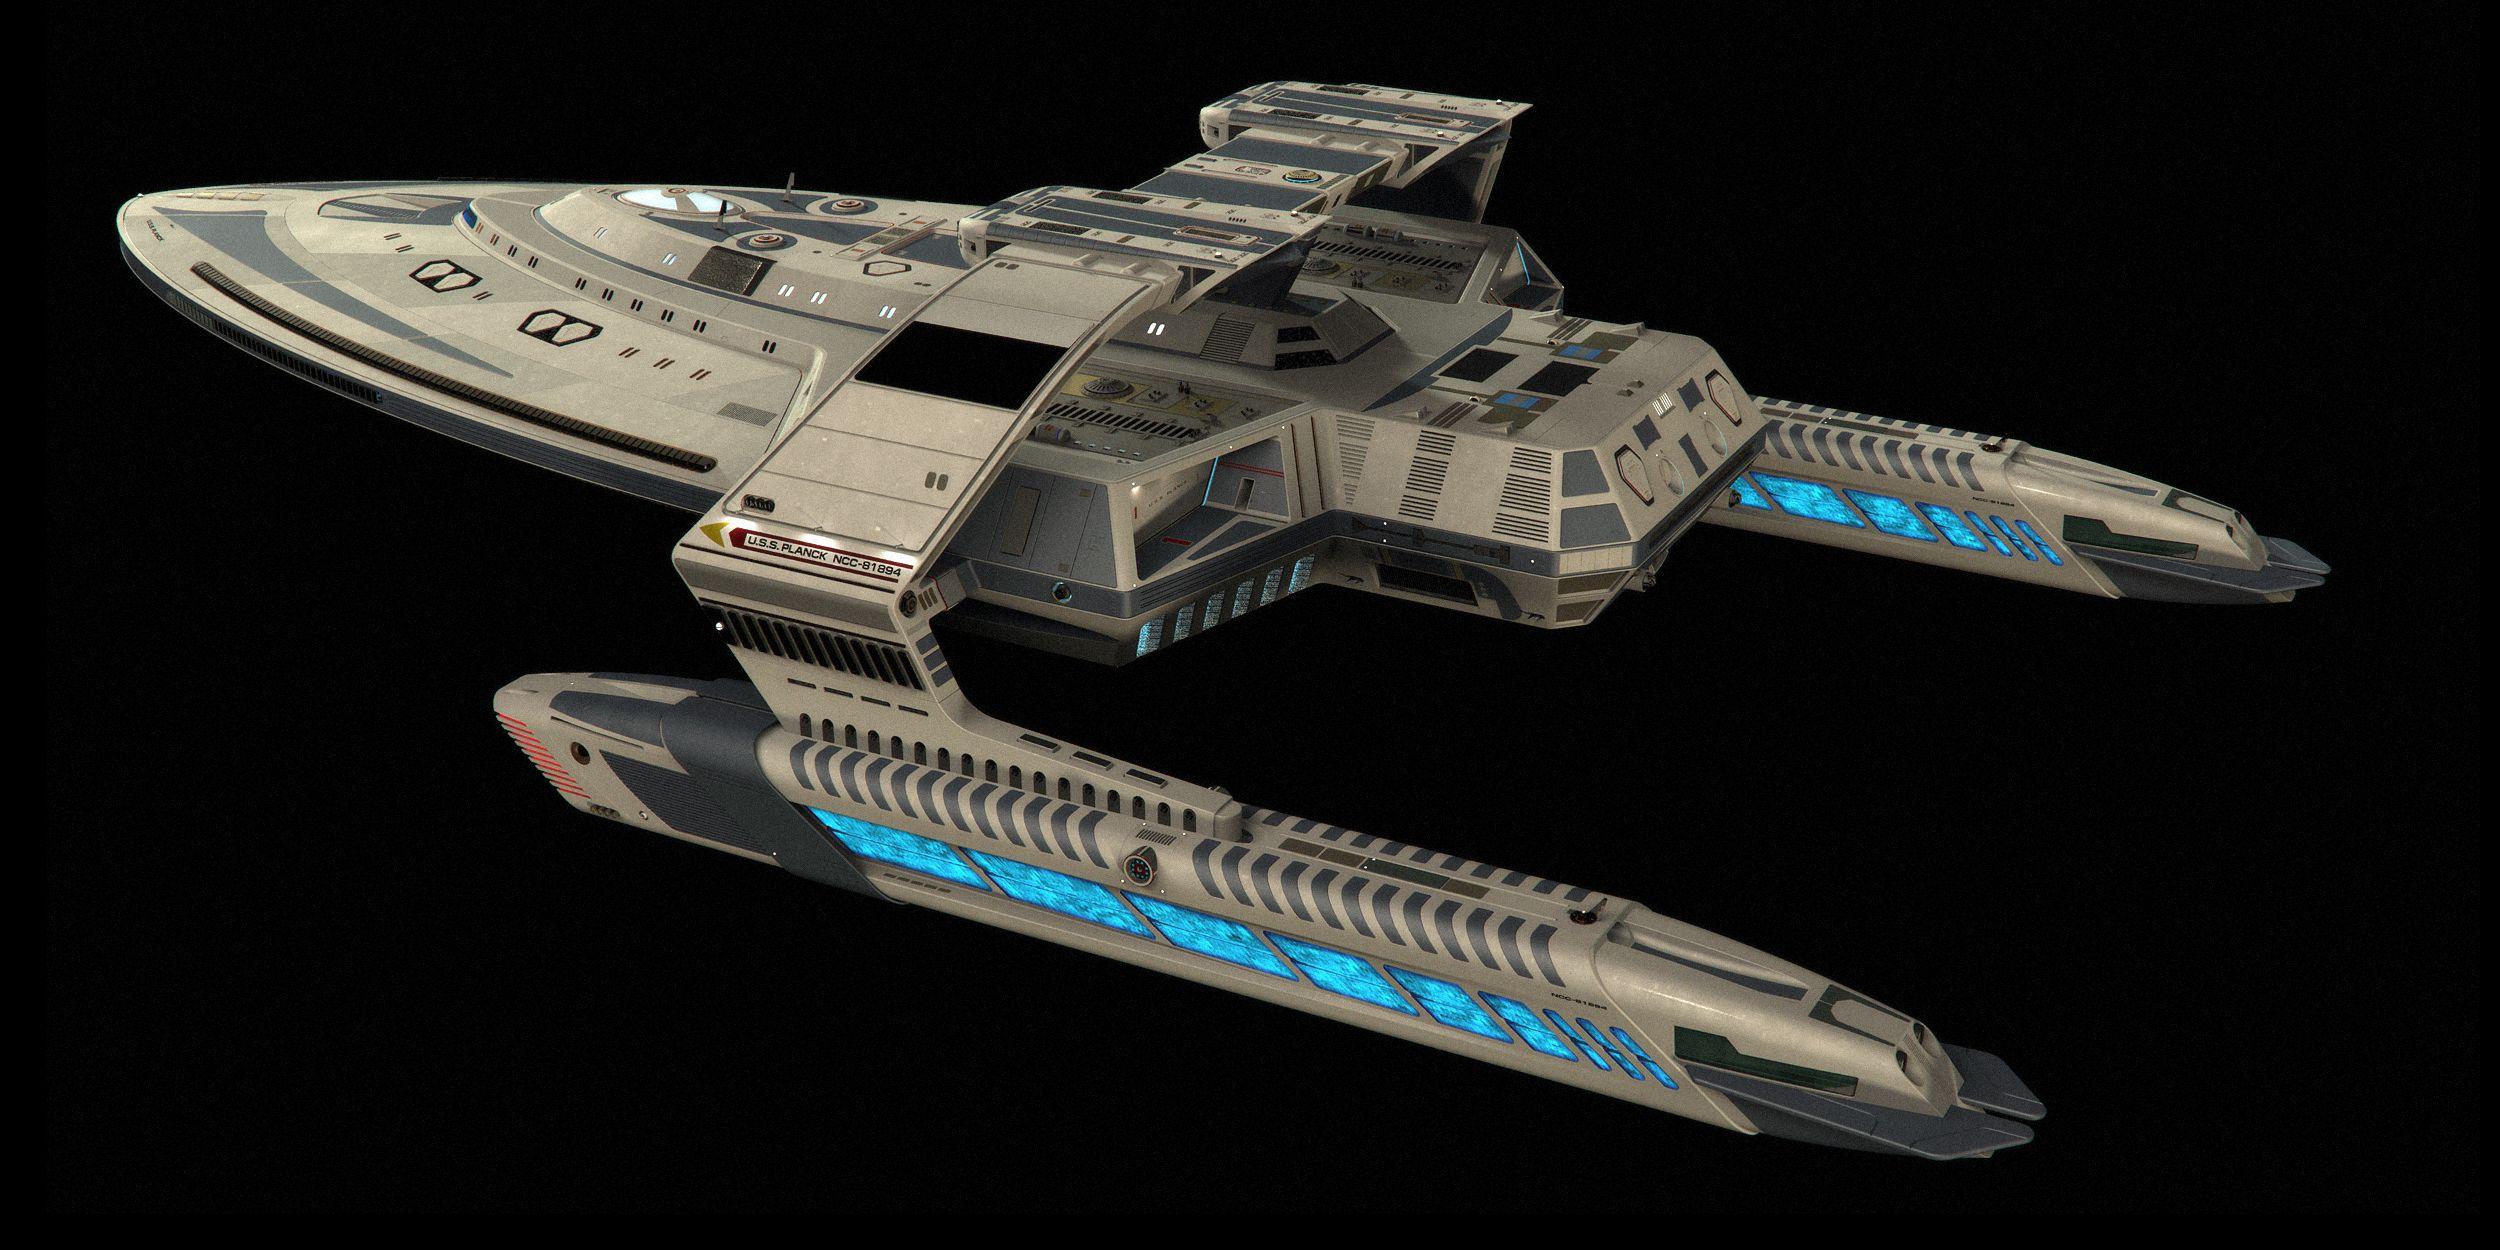 Merian class sifi pinterest star trek for Wohnung star trek design